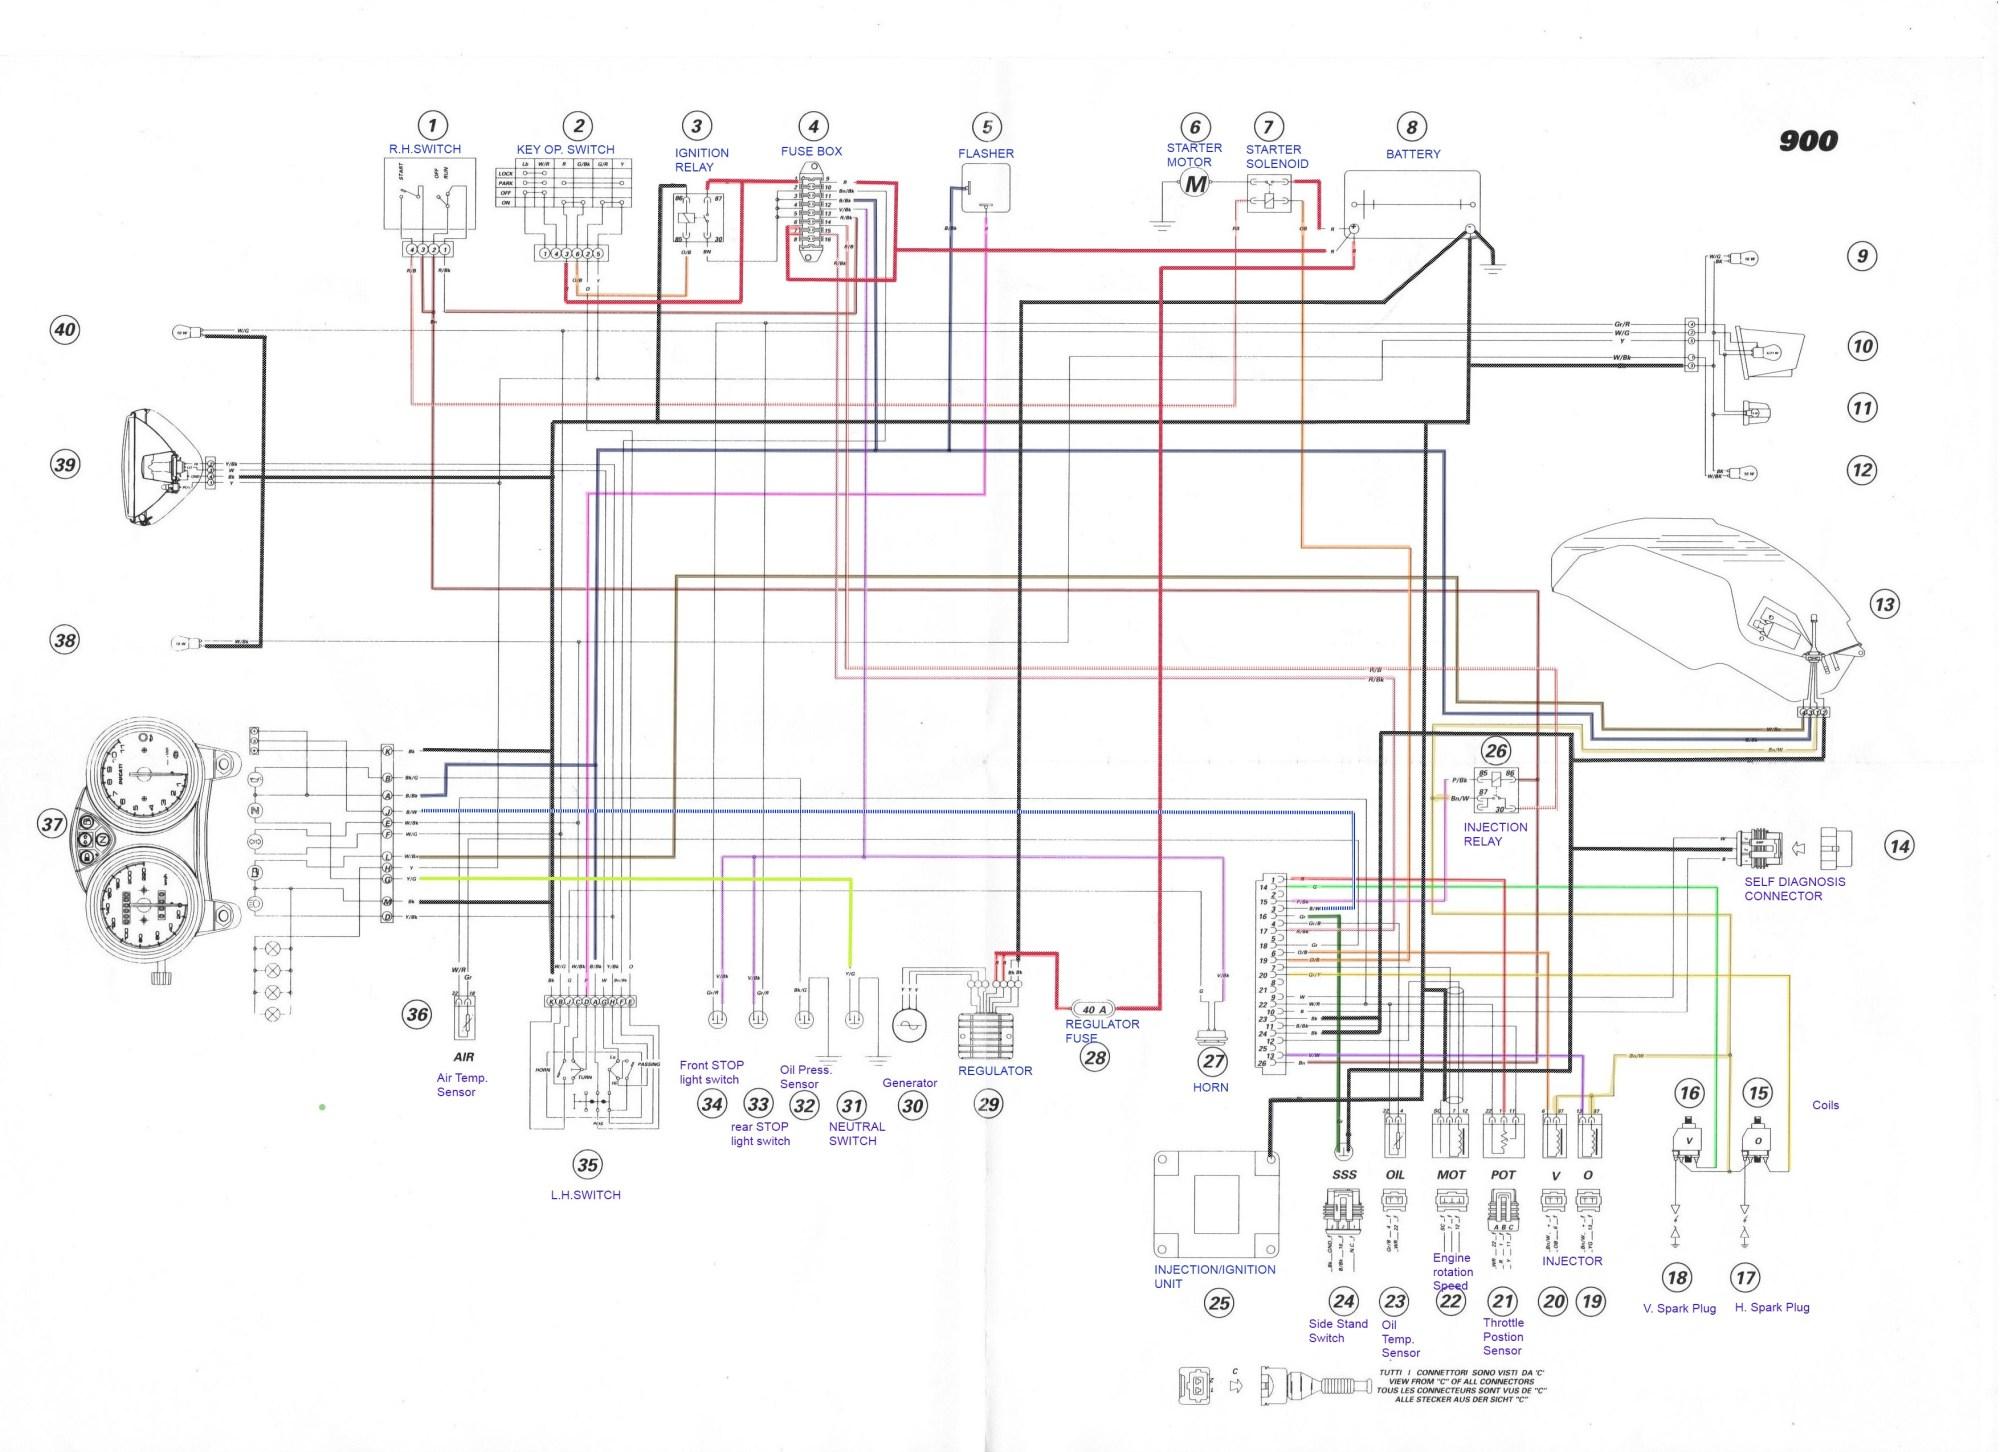 hight resolution of ducati 848 wiring diagram data diagram schematic 848 evo wiring diagram